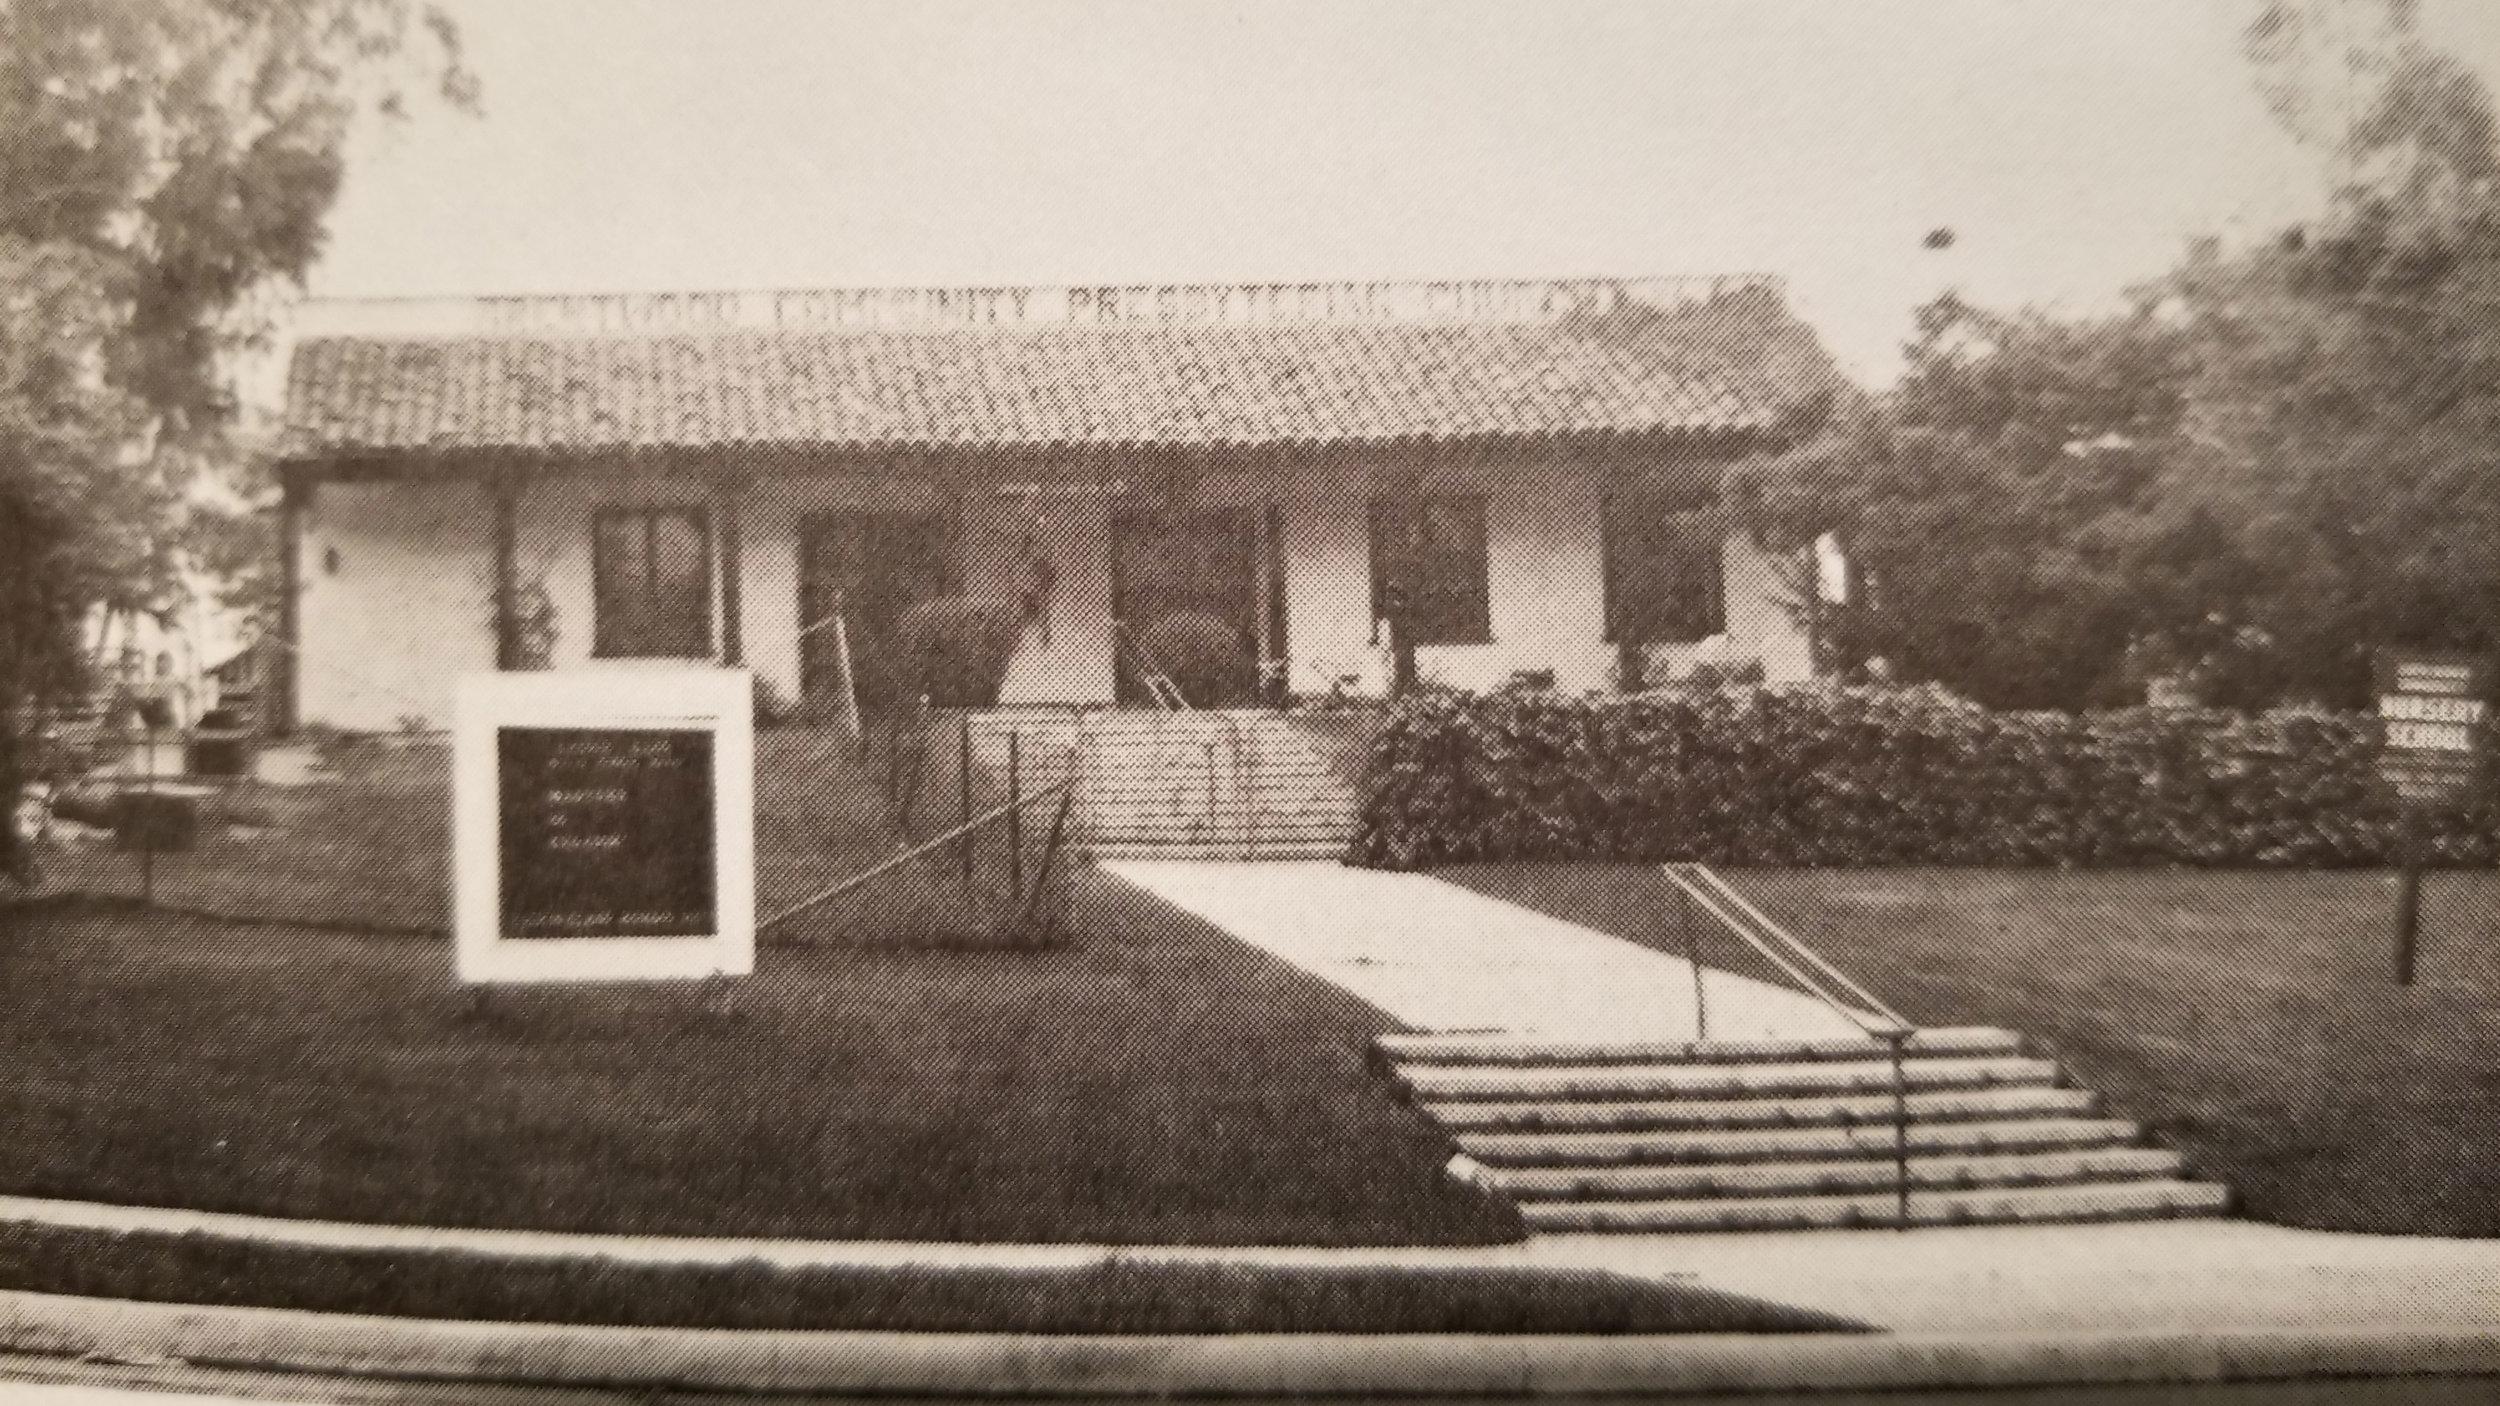 1940s_original_school_building.jpg